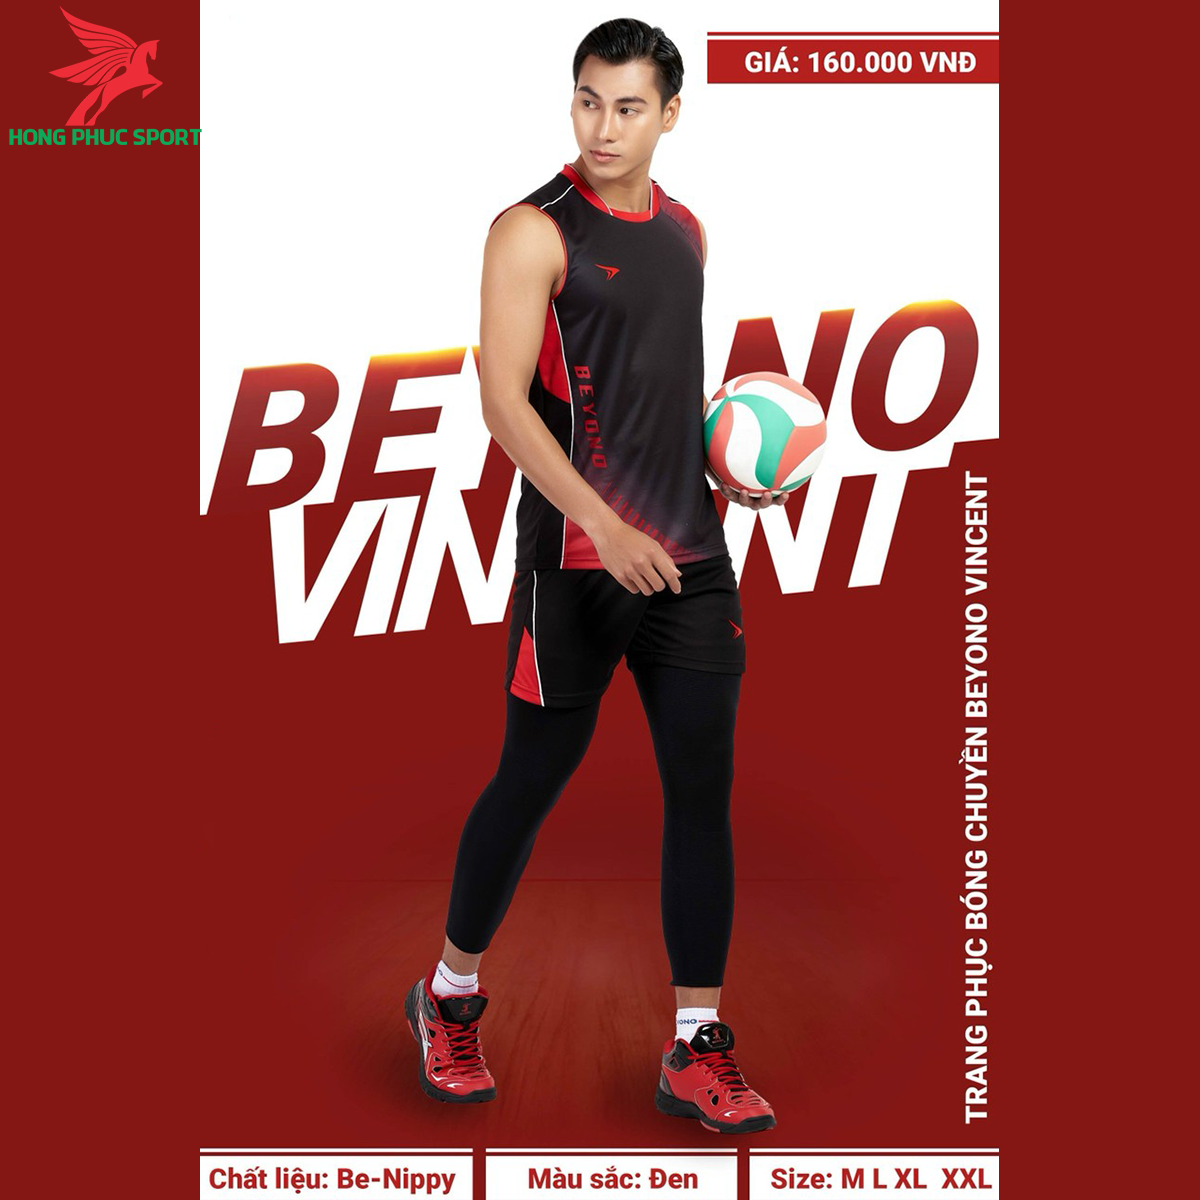 https://cdn.hongphucsport.com/unsafe/s4.shopbay.vn/files/285/ao-bong-chuyen-beyono-vincent-mau-den-3-6039bf62062f5.png